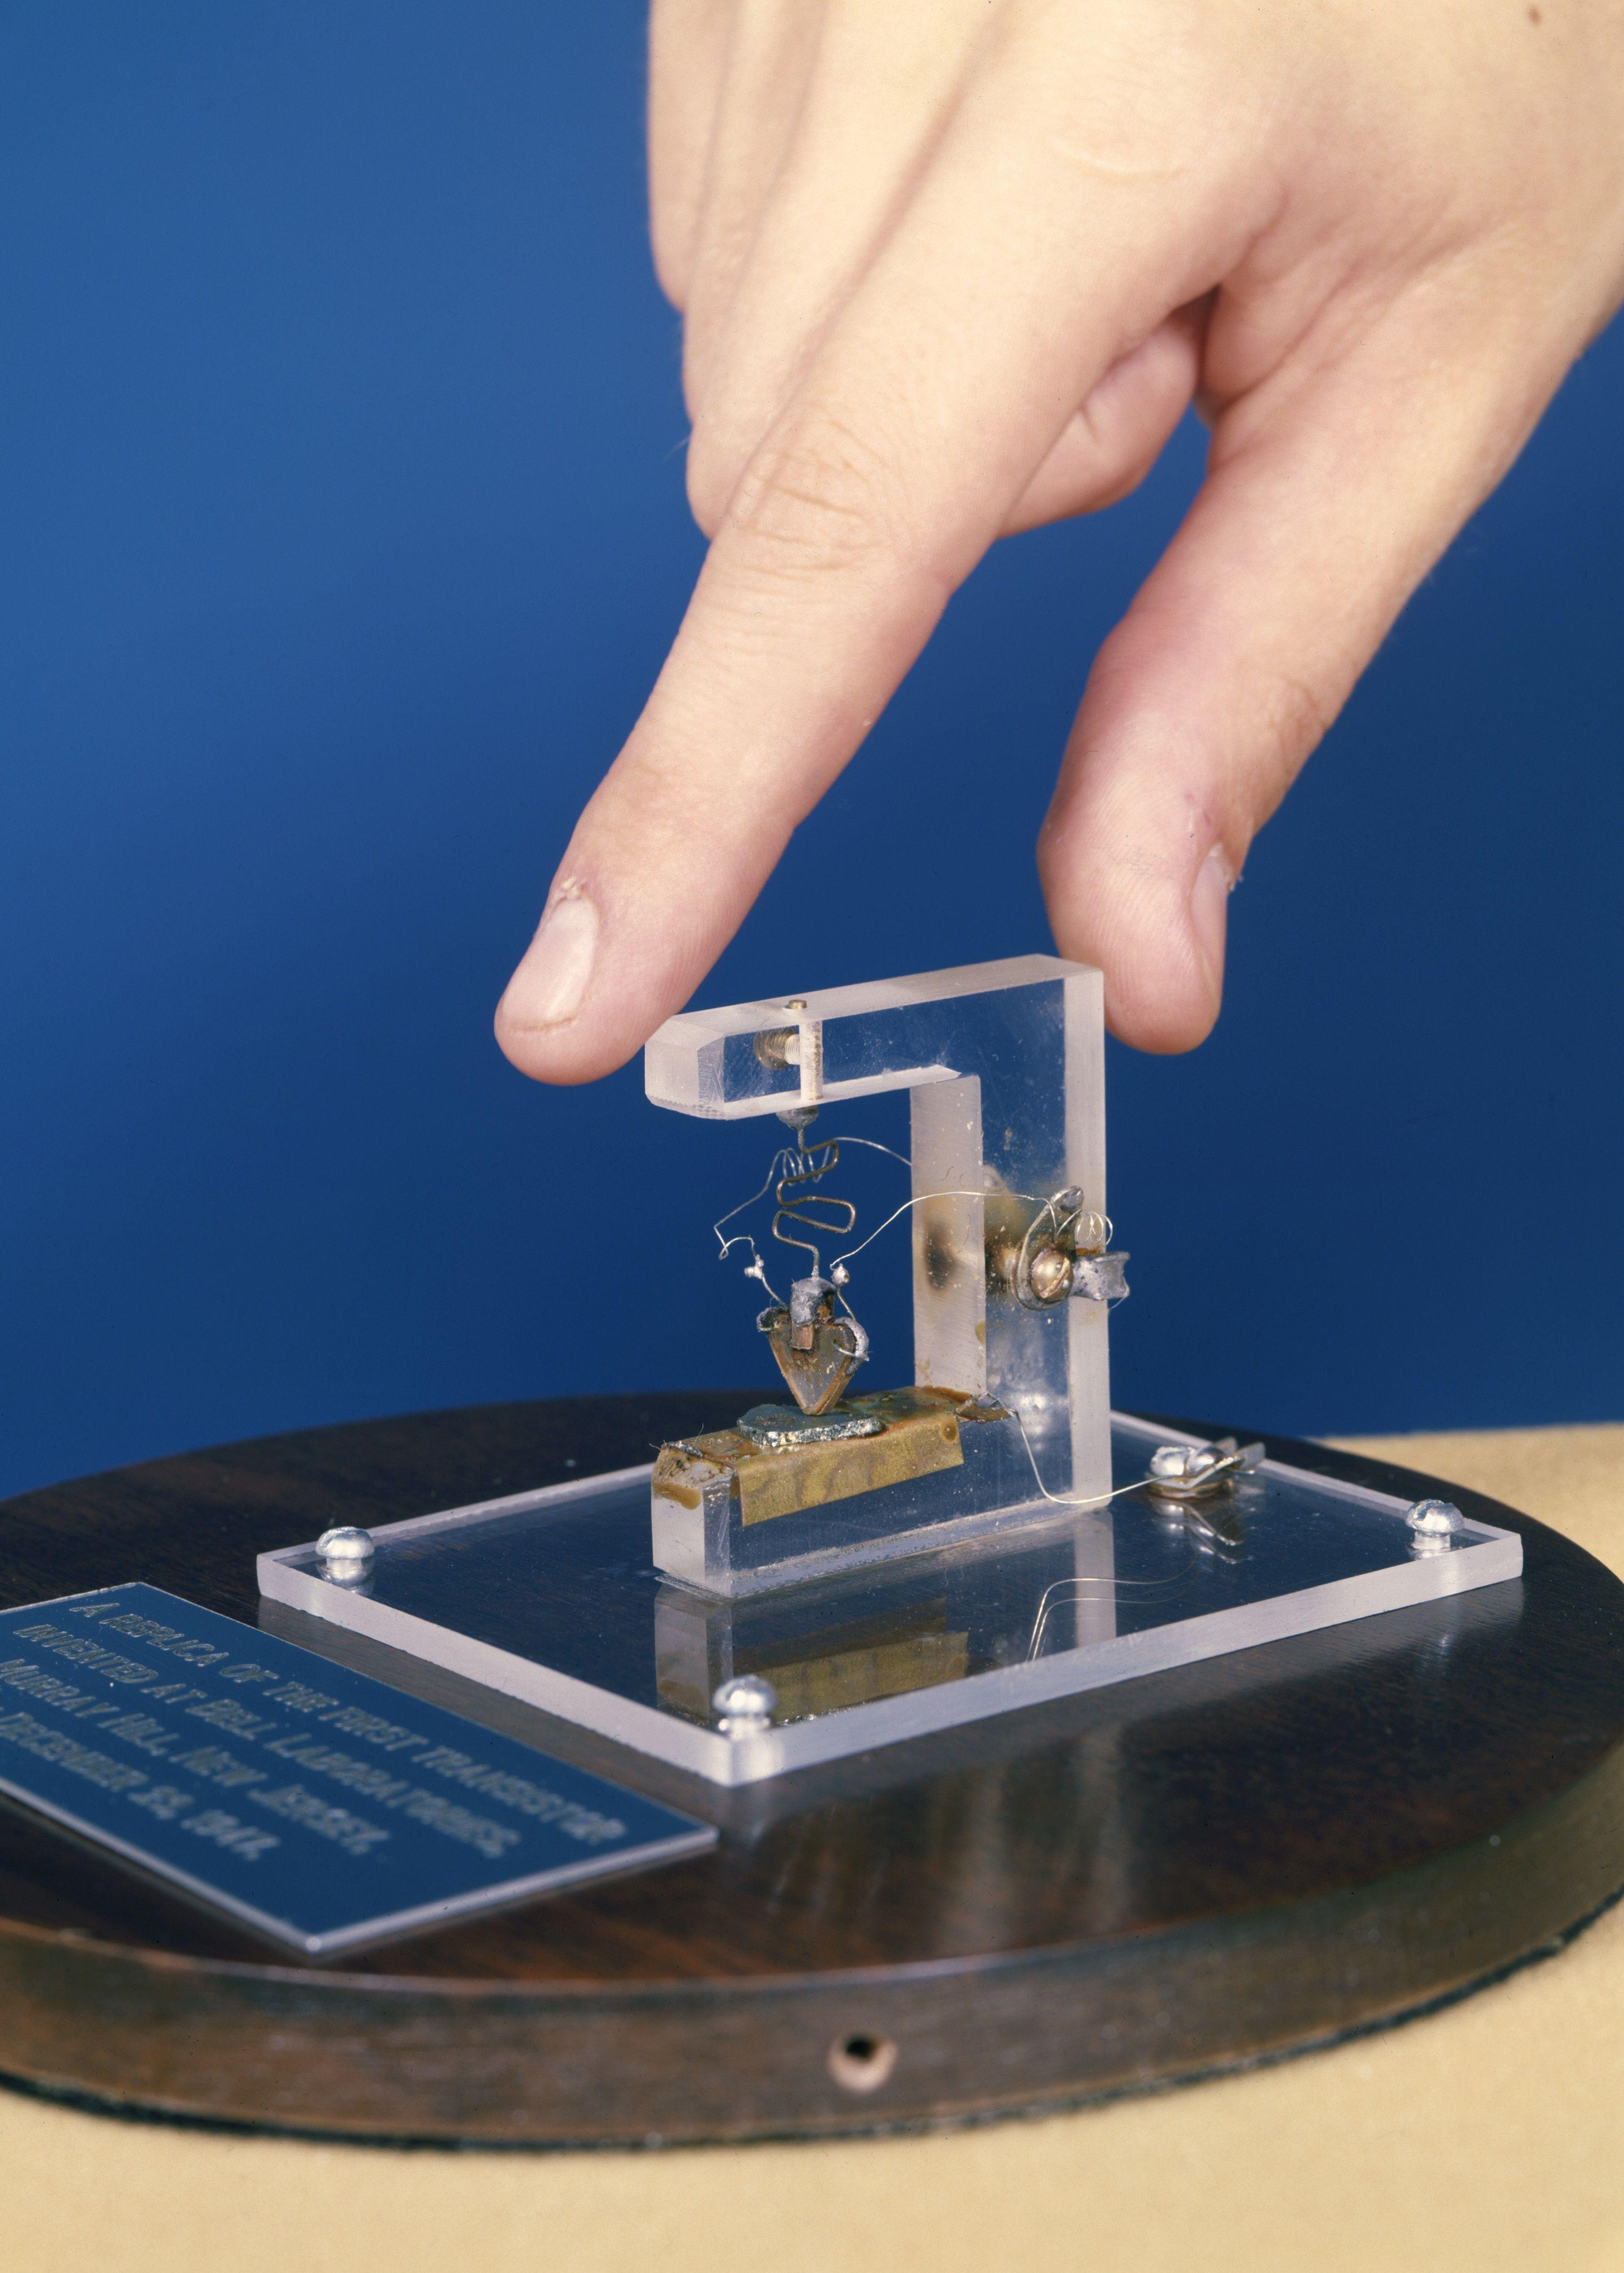 First Transistor 1947 ทรานซิสเตอร์ ตัวแรก ของโลก 1947